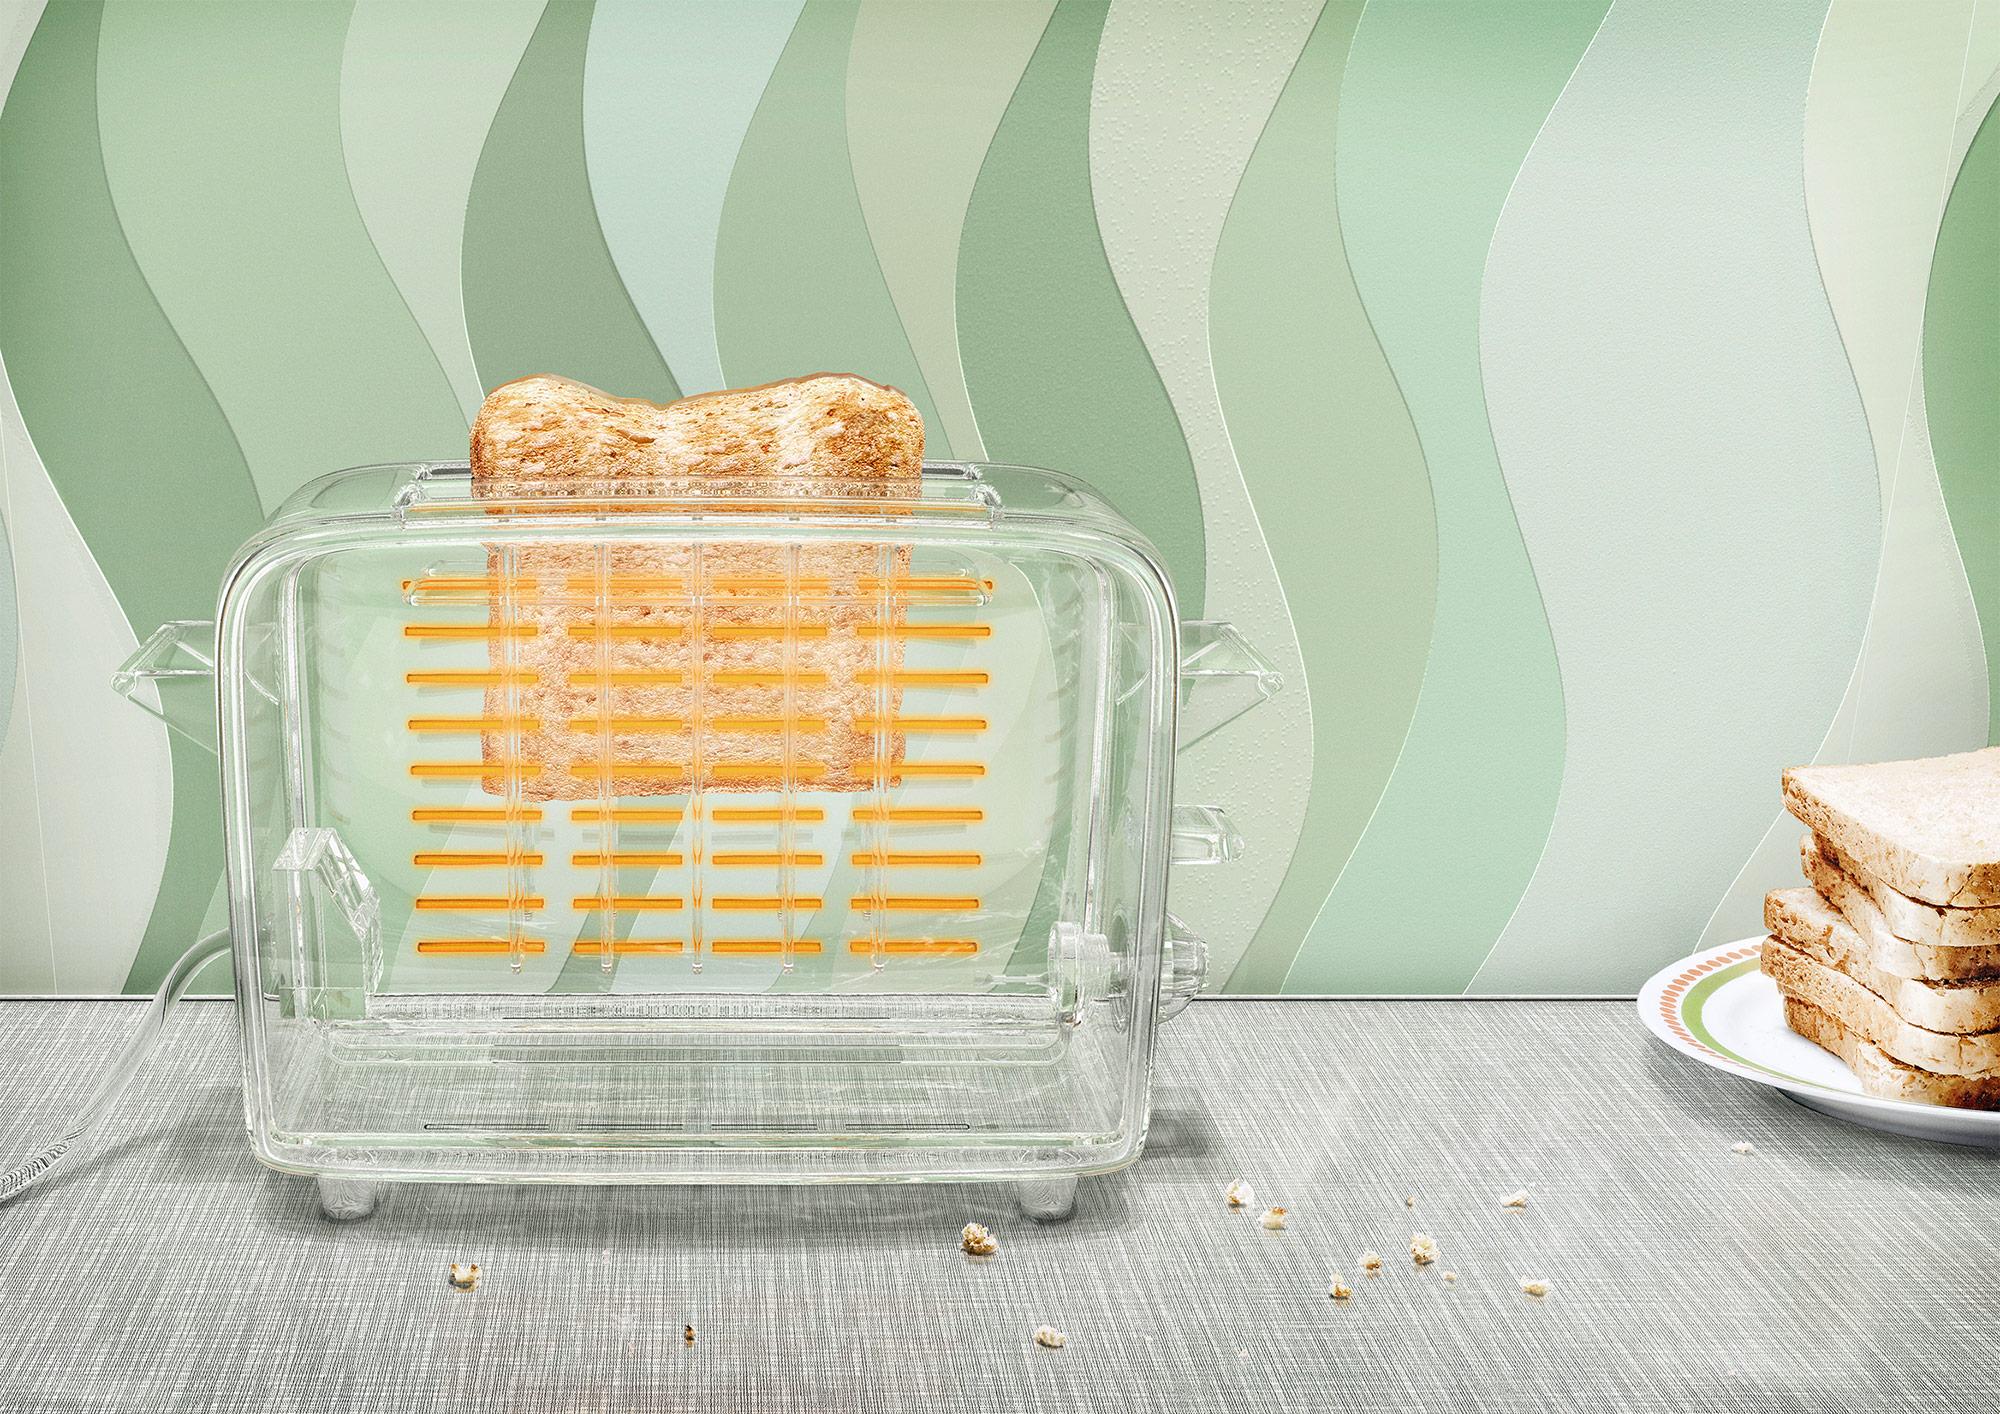 CGI Rendering 3d BMWI Energie transparent Toaster Idris Kolodziej